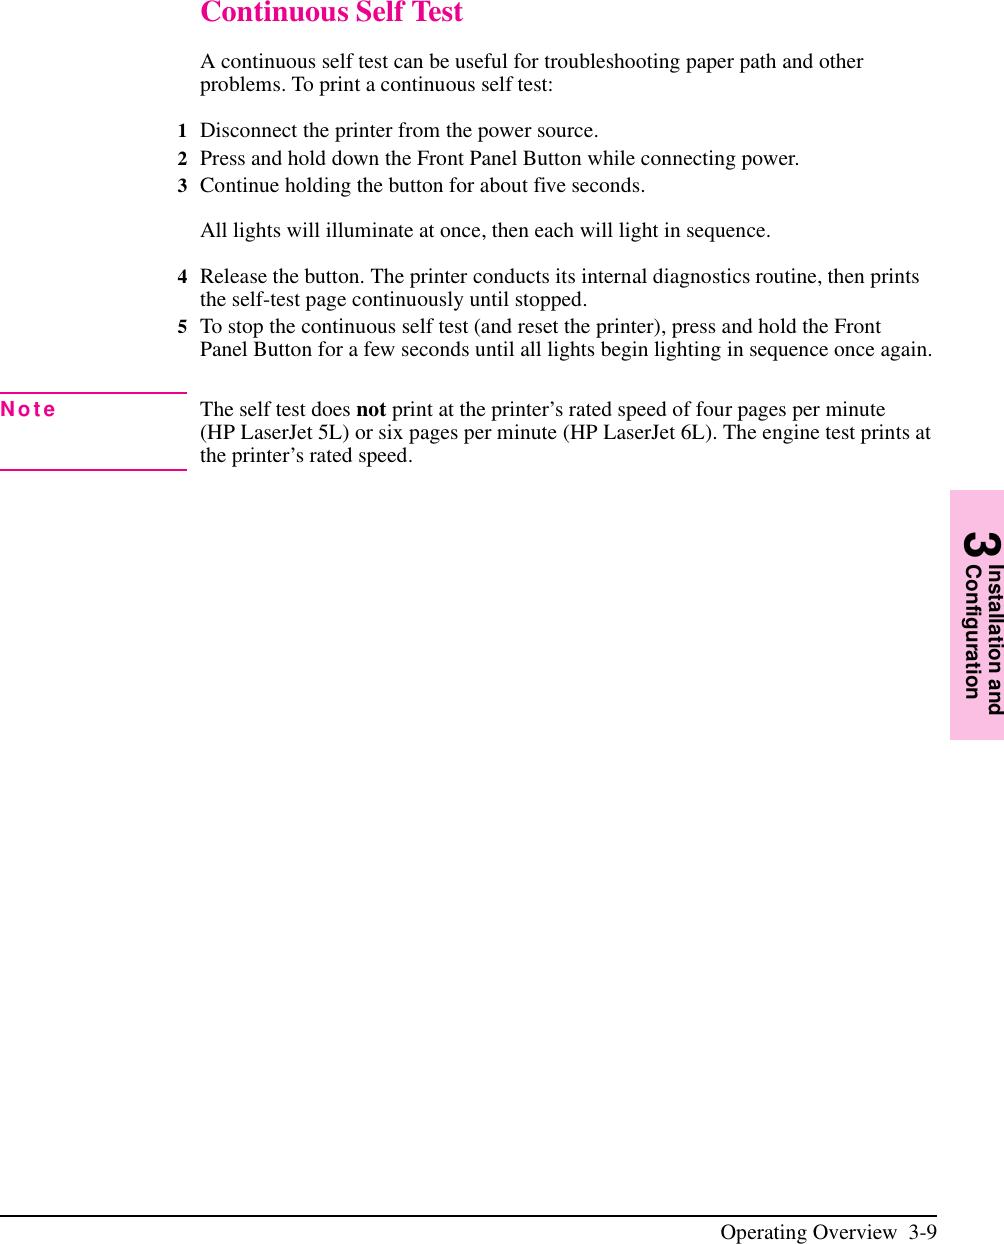 Hp Laserjet 5L Users Manual And 6L Printer Service Manual